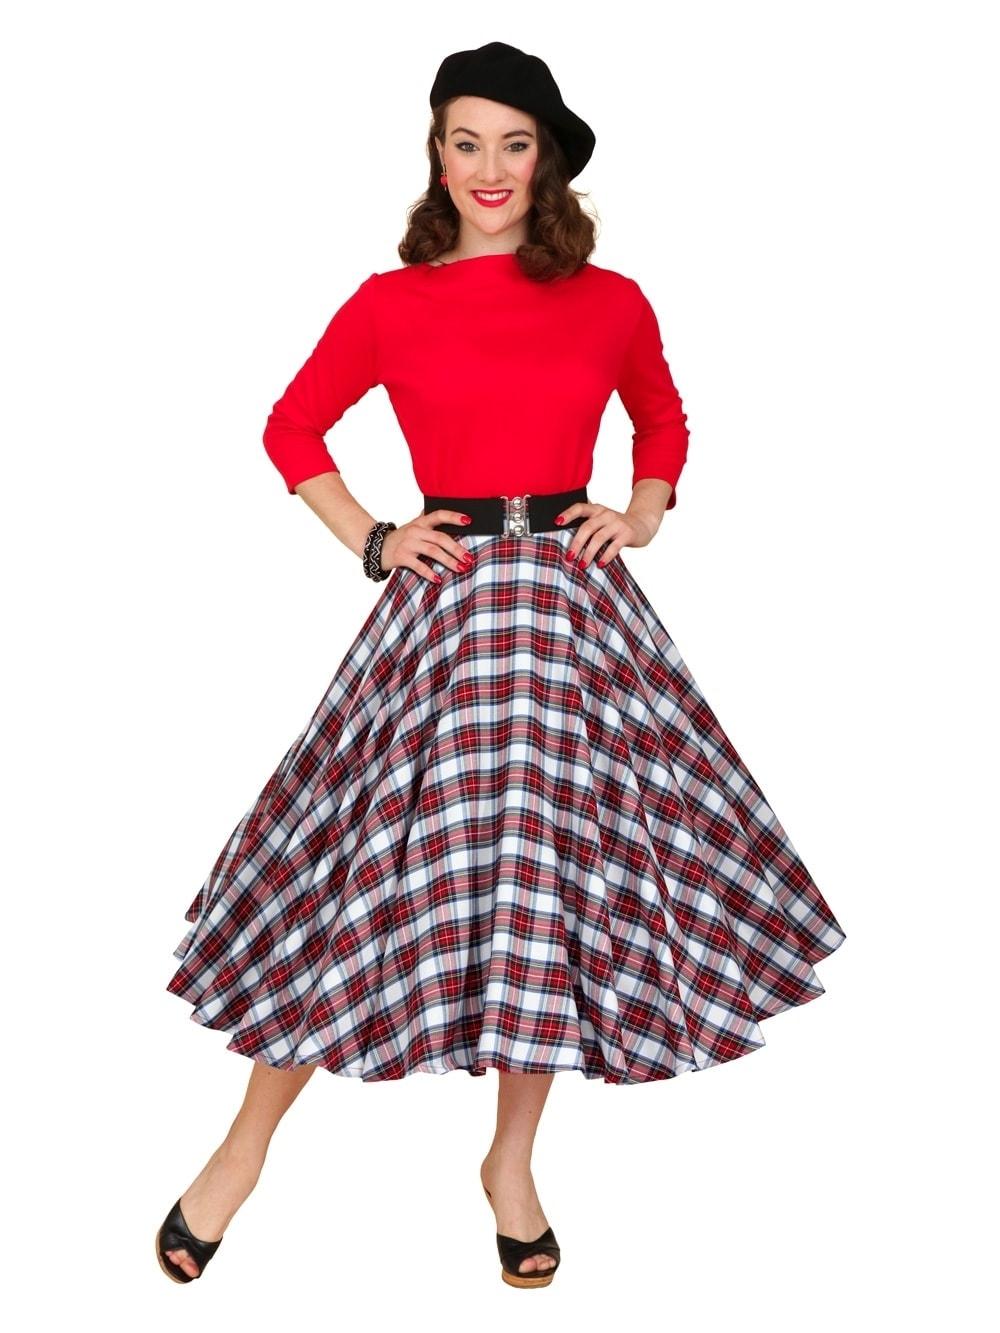 96b5113def 1950s Circle Skirt White Red Tartan from Vivien of Holloway